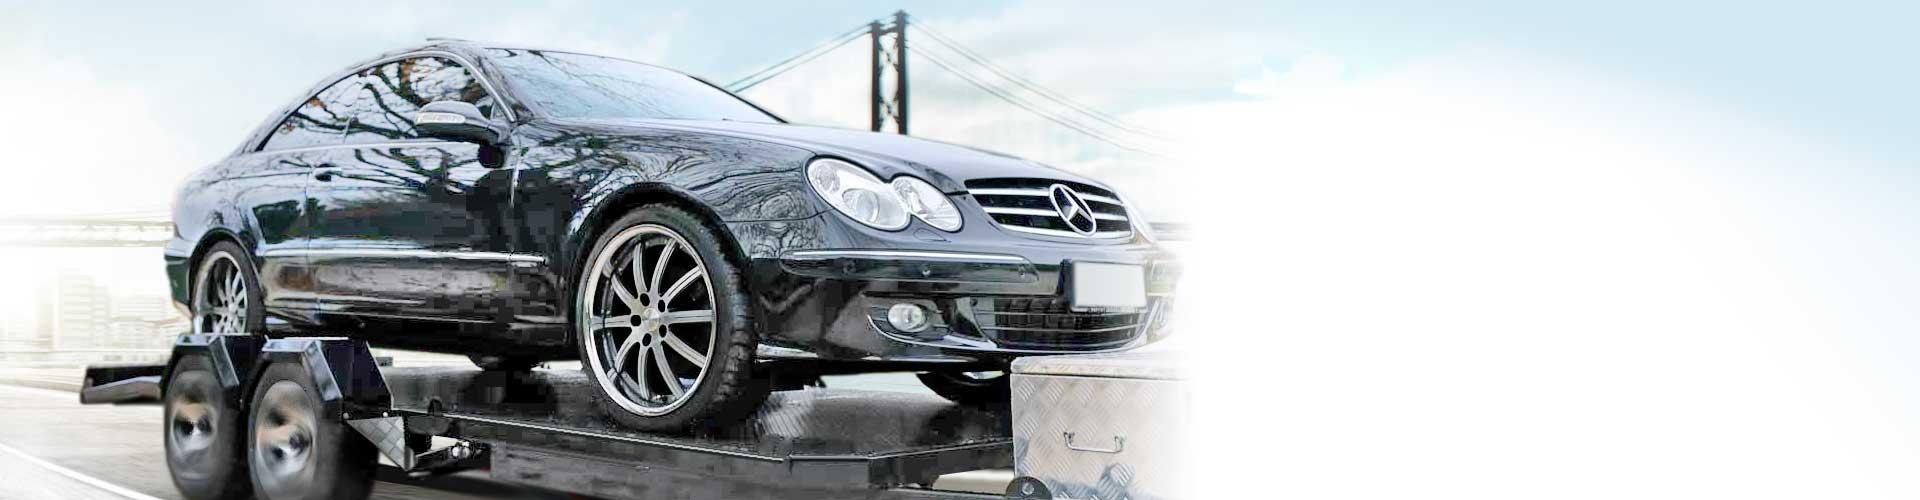 vehicle transportation west midlands